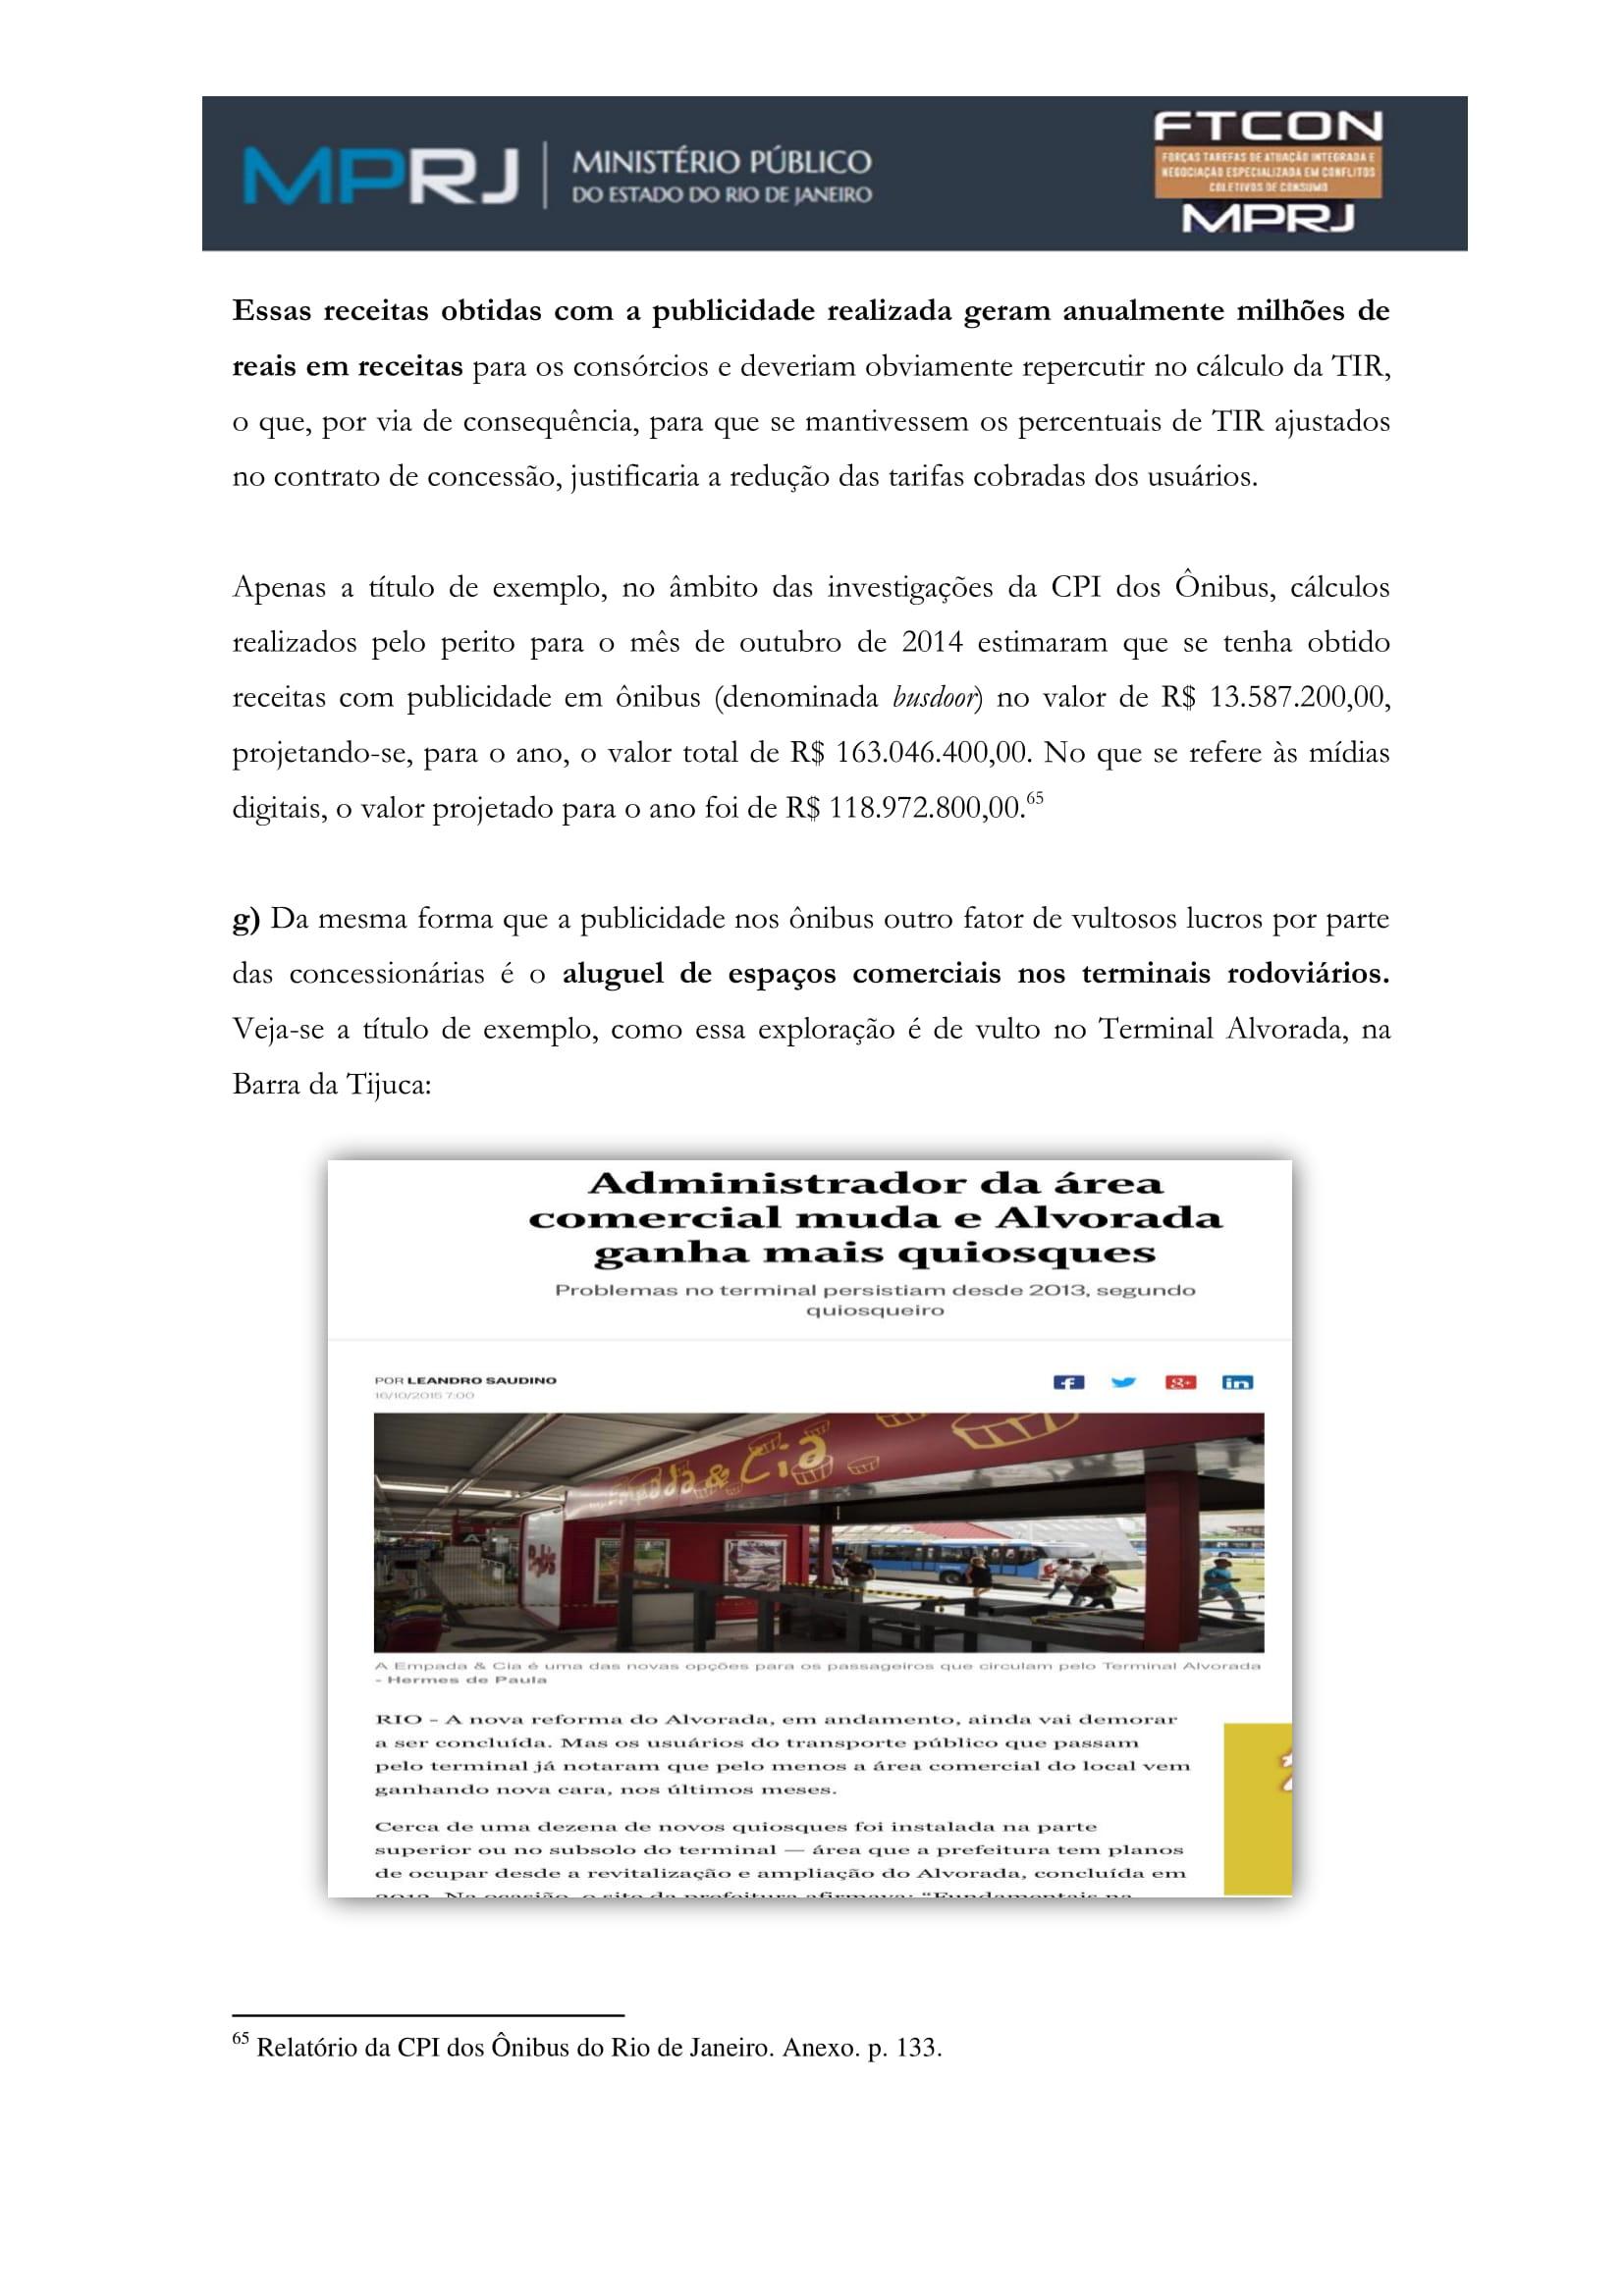 acp_caducidade_onibus_dr_rt-078